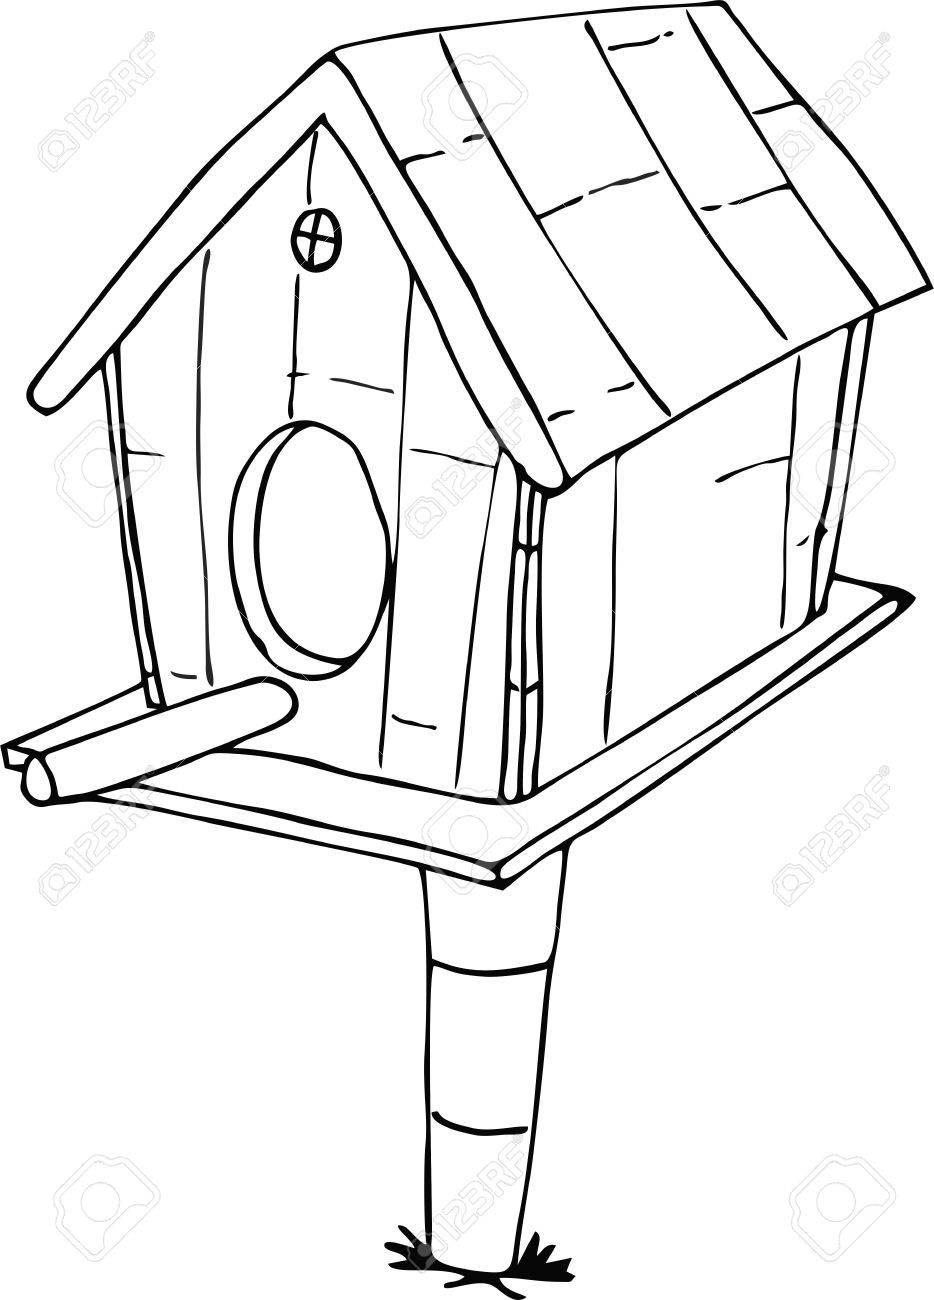 934x1300 Drawn Doodle Style Bird House Cartoon Royalty Free Cliparts